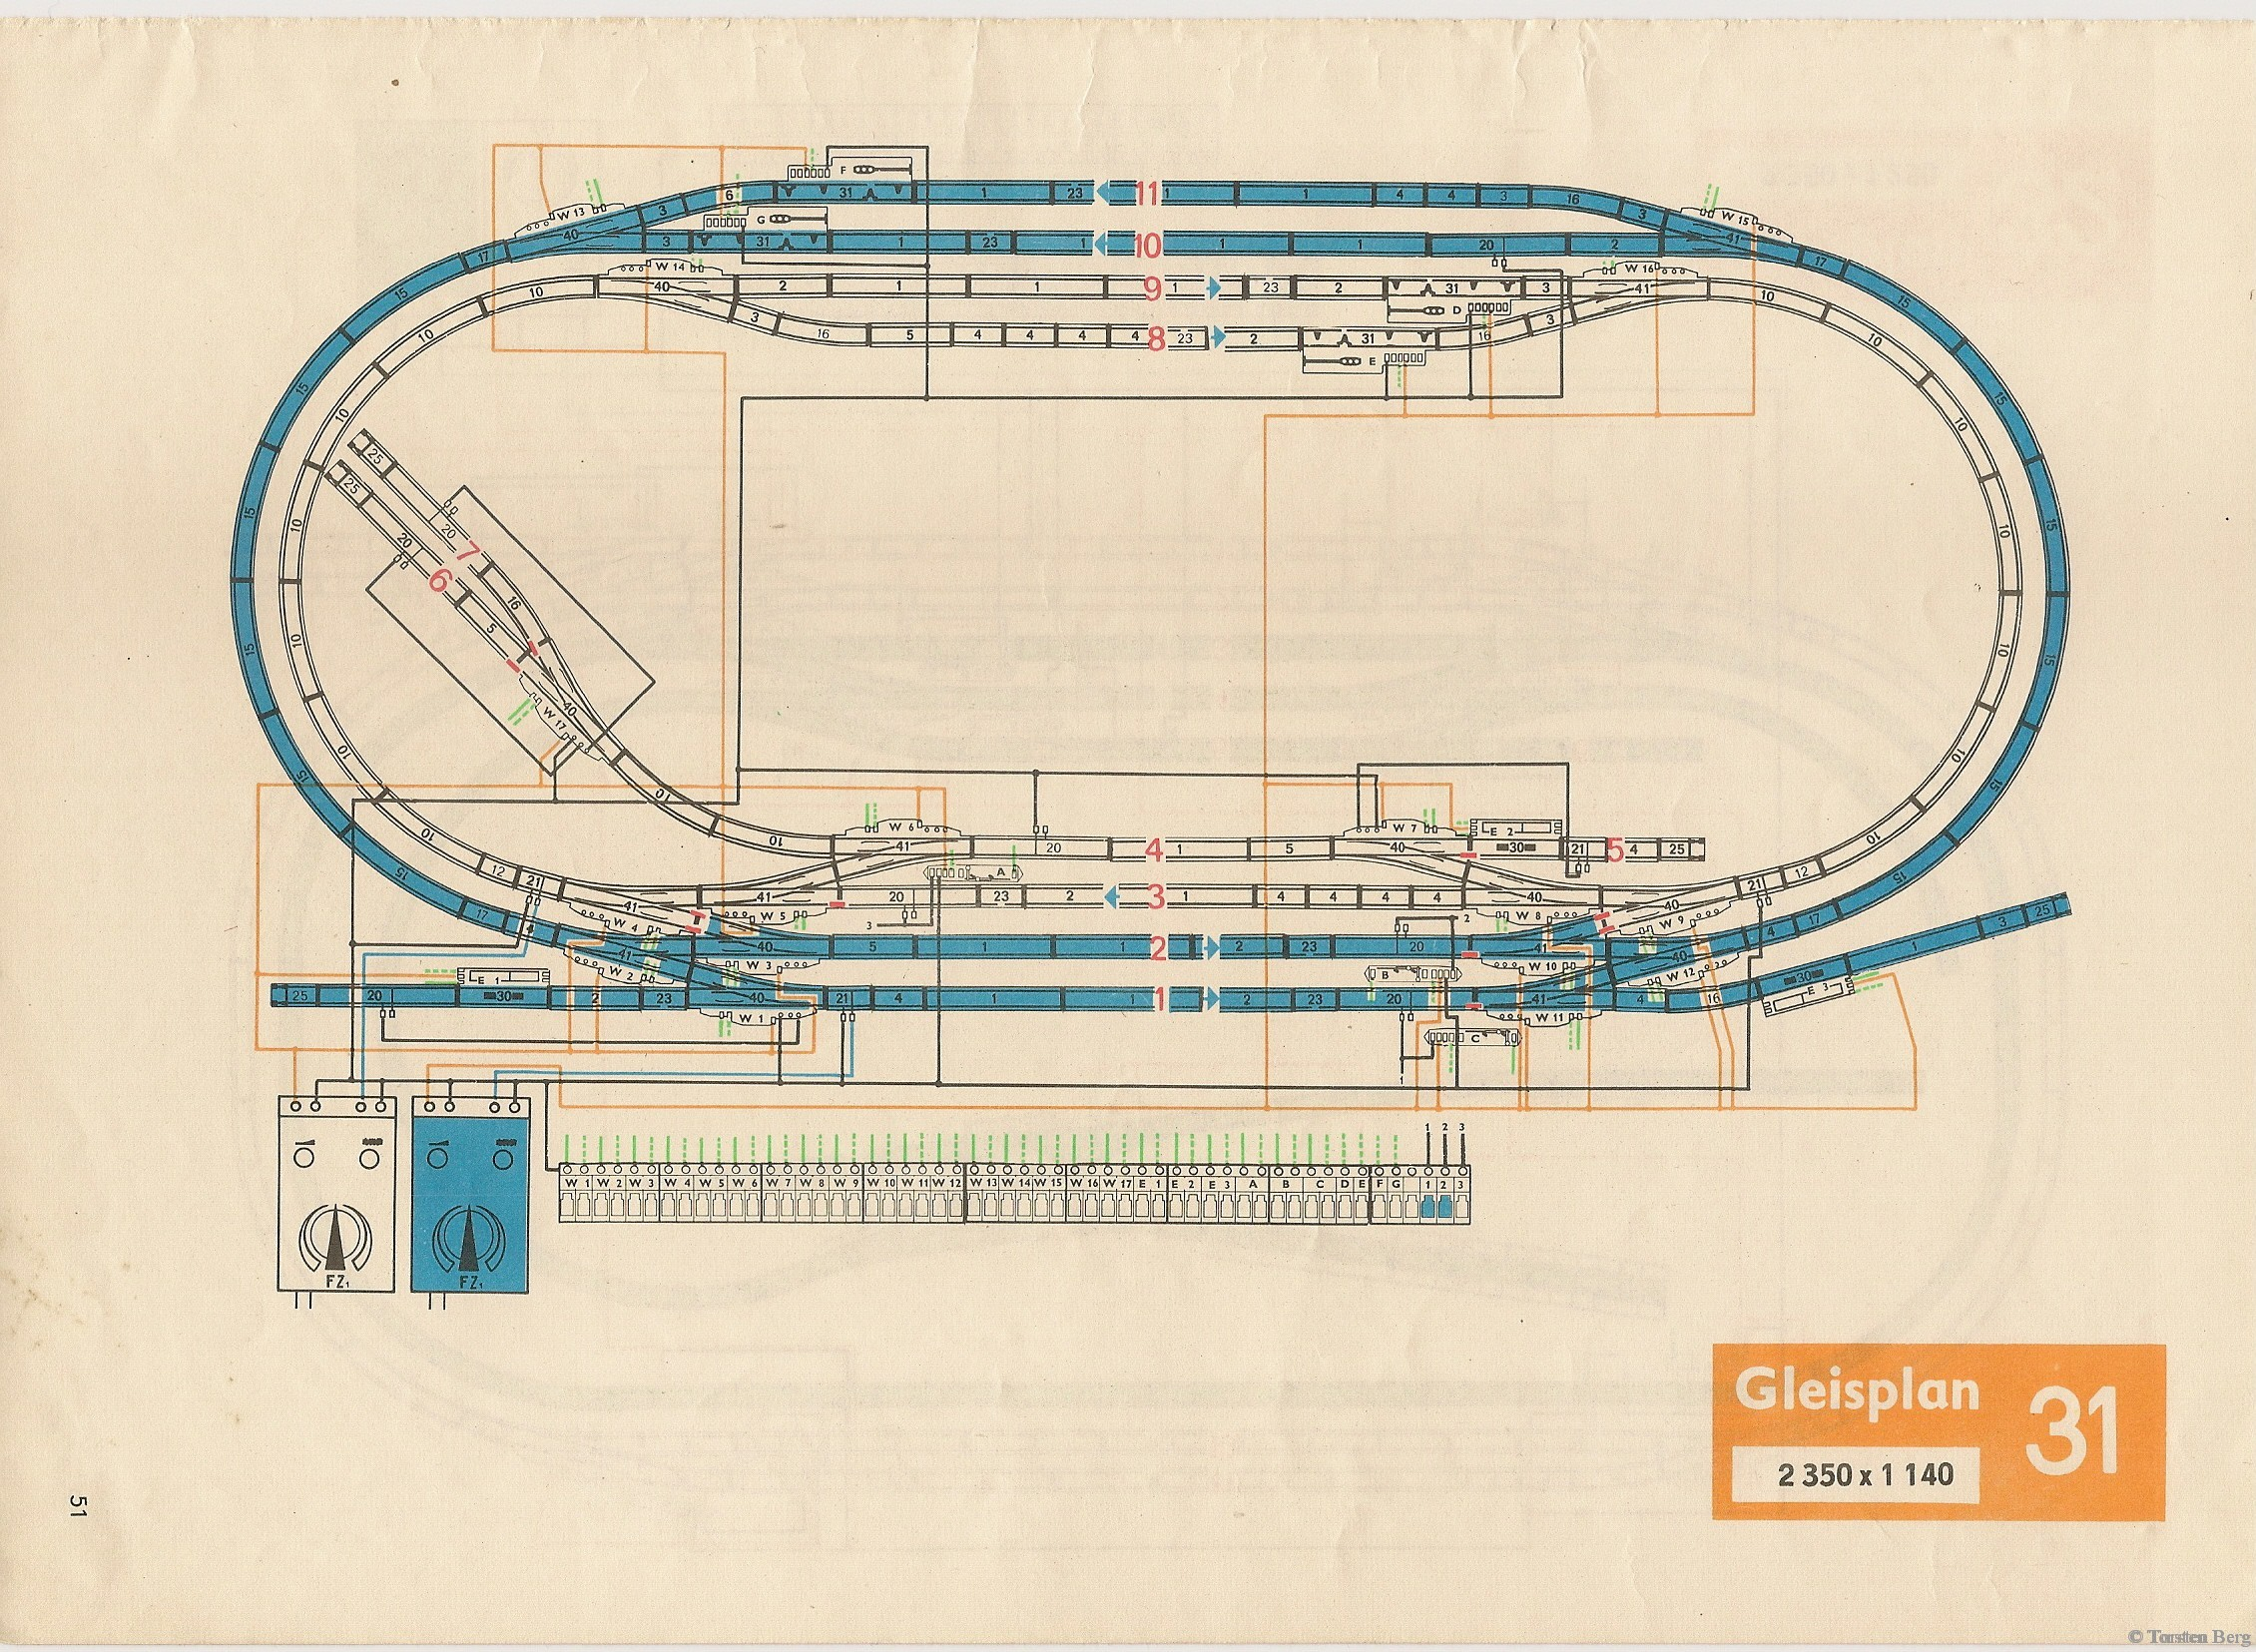 52 VEB Kombinat PIKO Standardgleis-Gleisplan 31